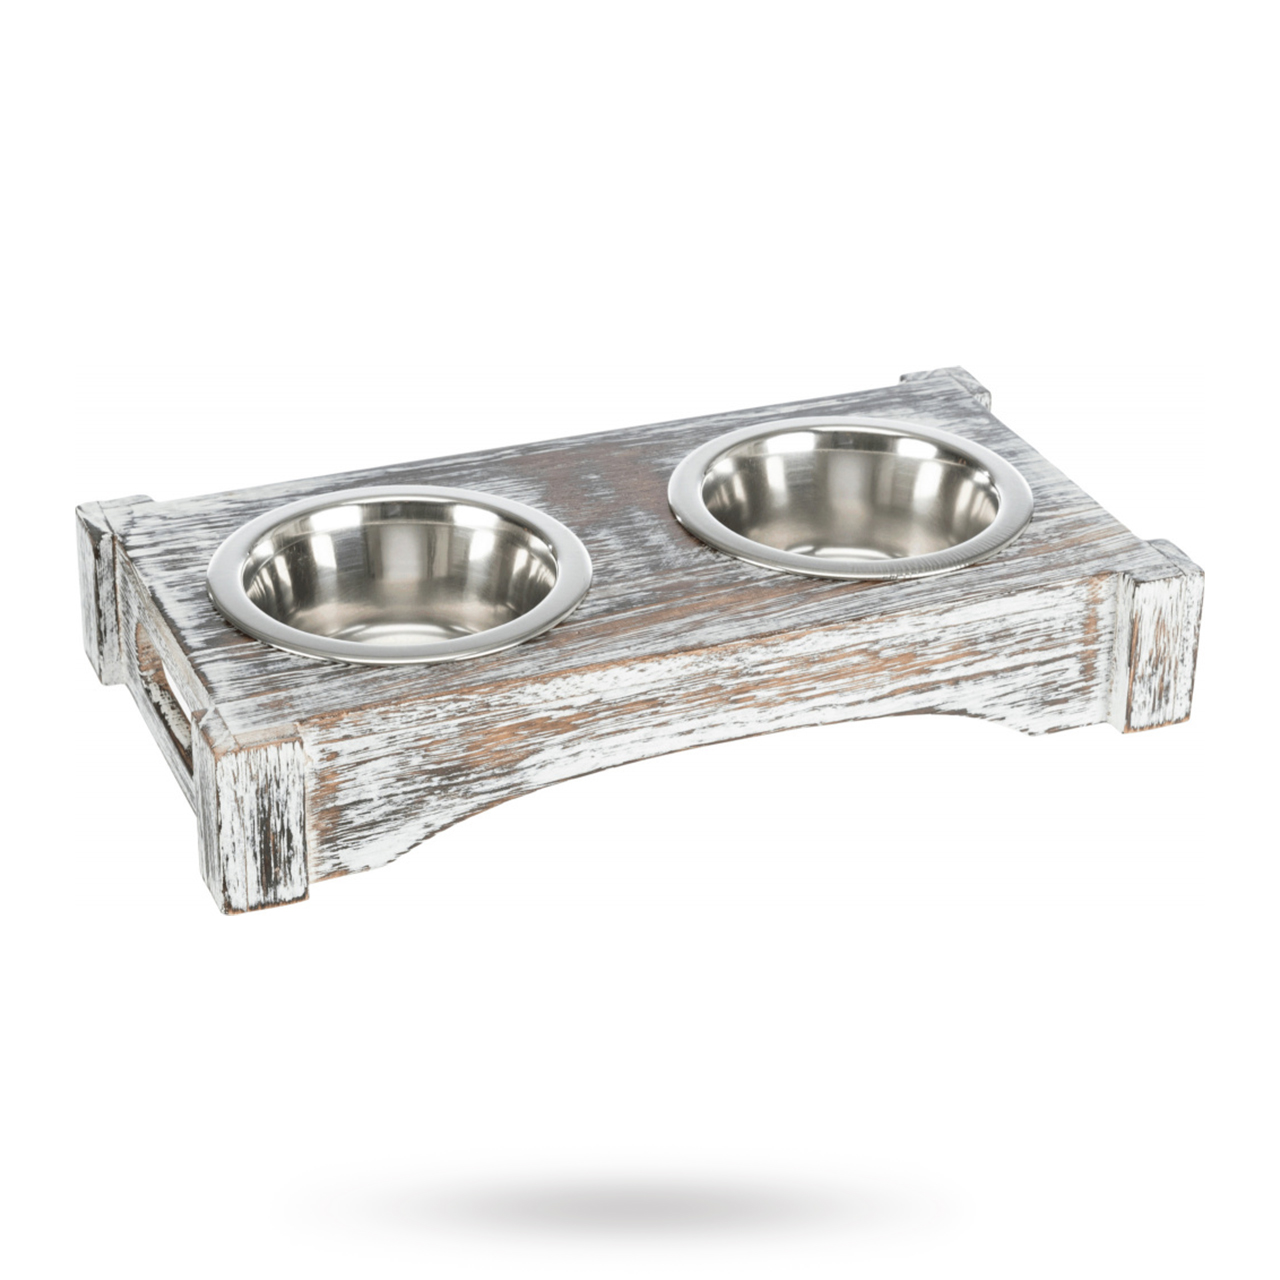 Matbar Vit Trä/Rostfritt Stål